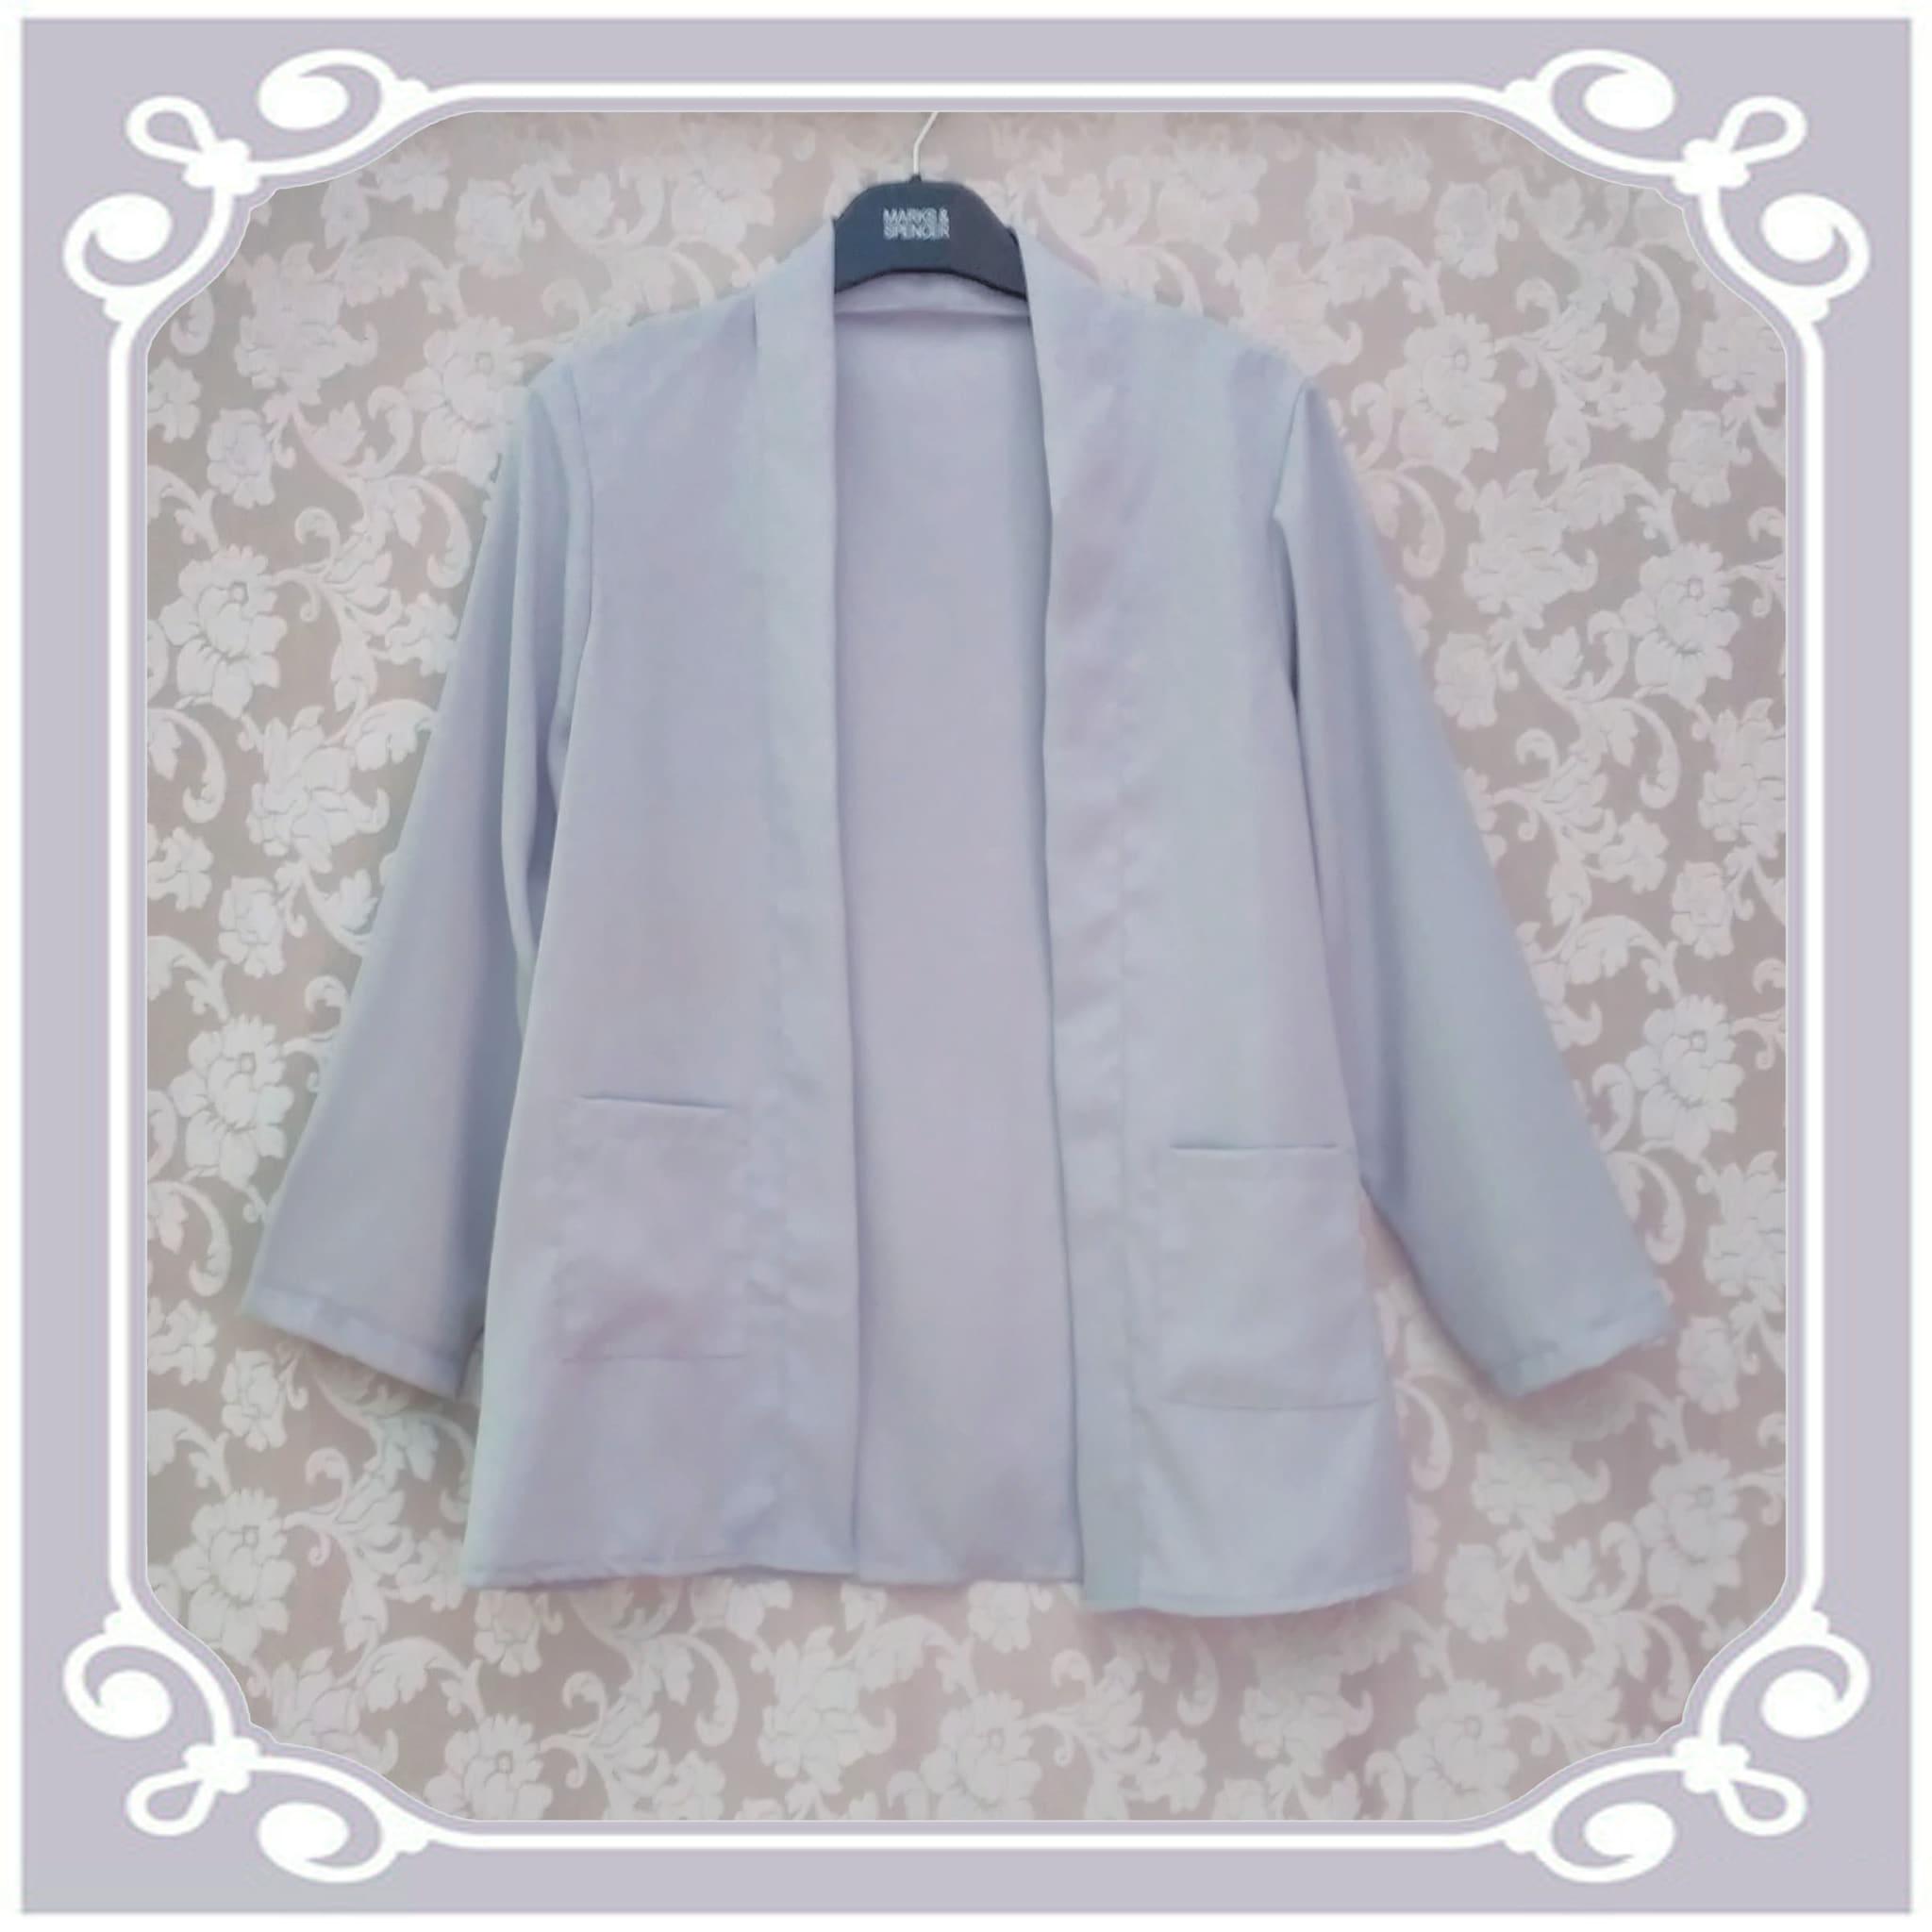 Outer lengan panjang cardigan panjang blazer baju kerja wanita blouse